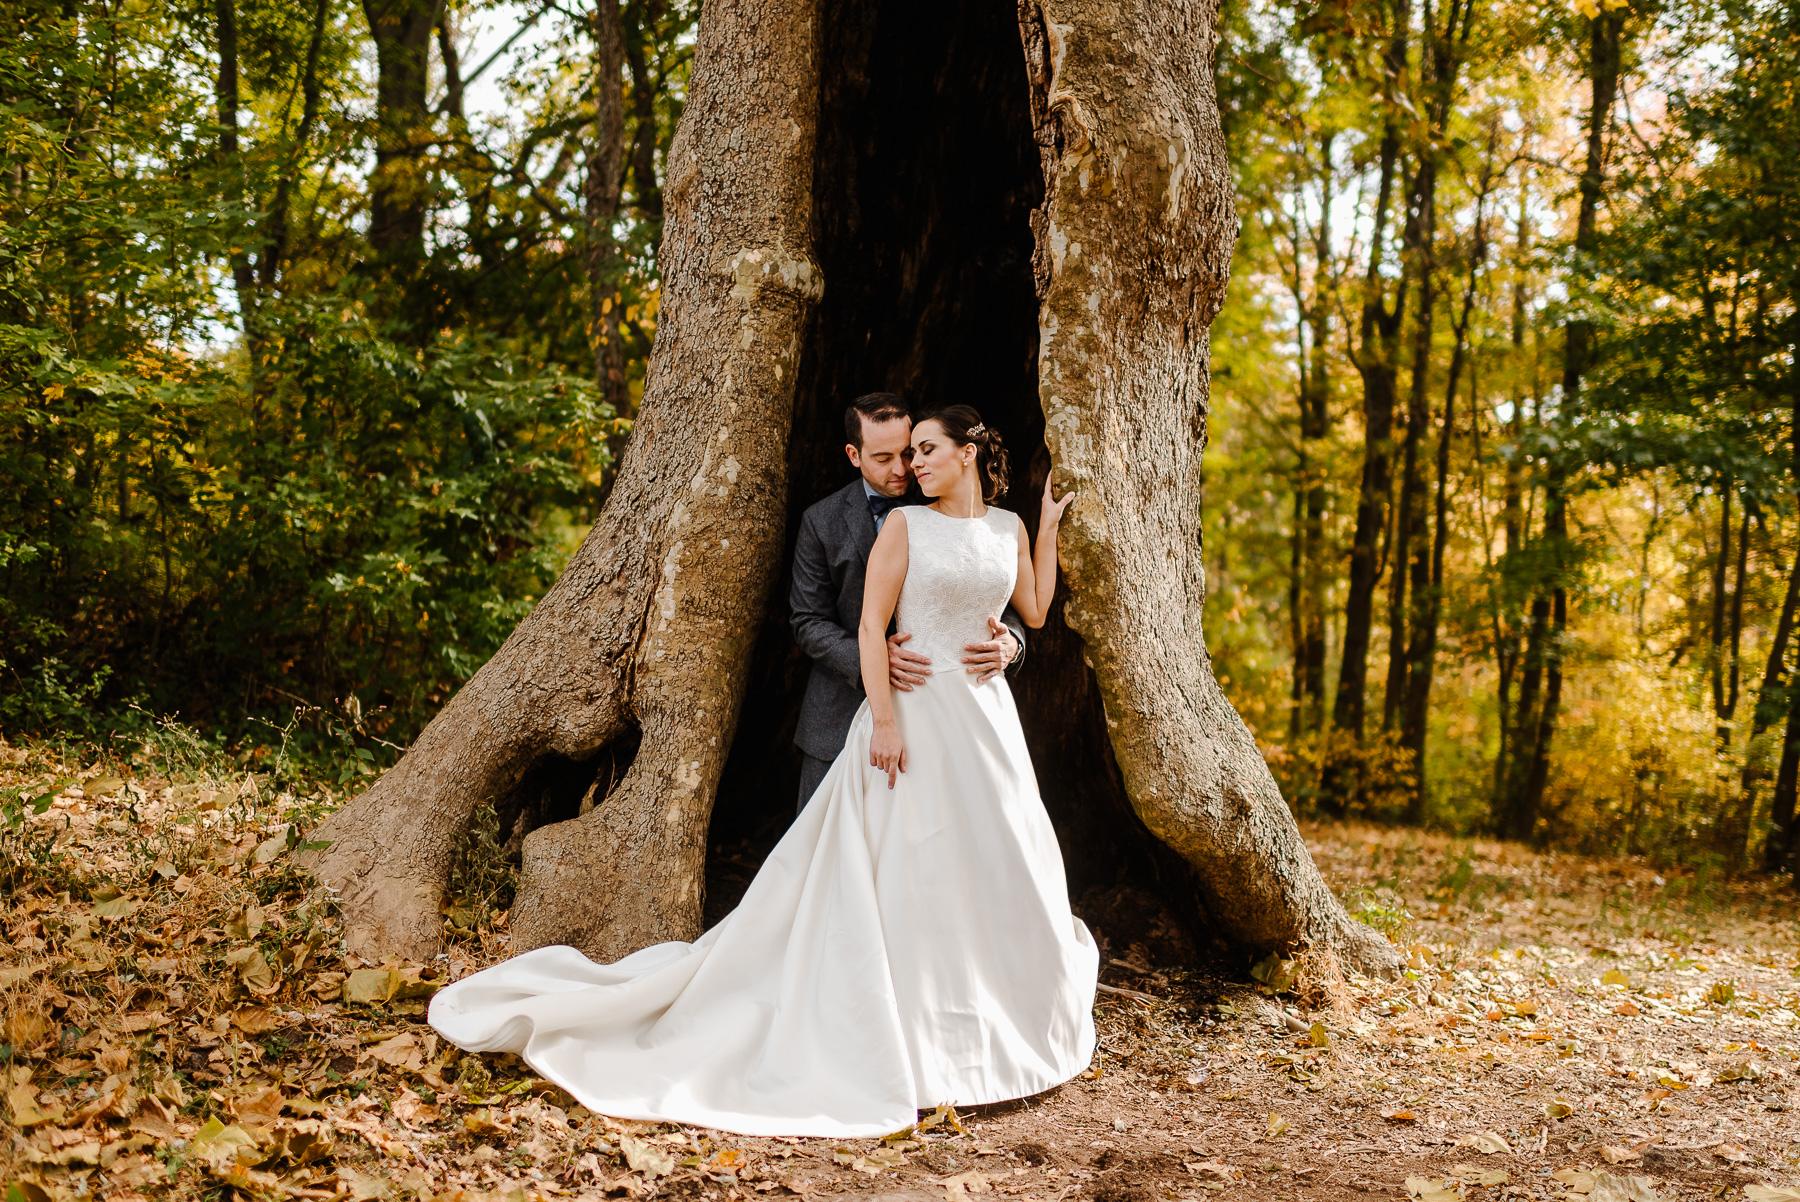 42-Laurita Winery Wedding New Jersey Wedding Photographer Laurita Winery Weddings Longbrook Photography.jpg